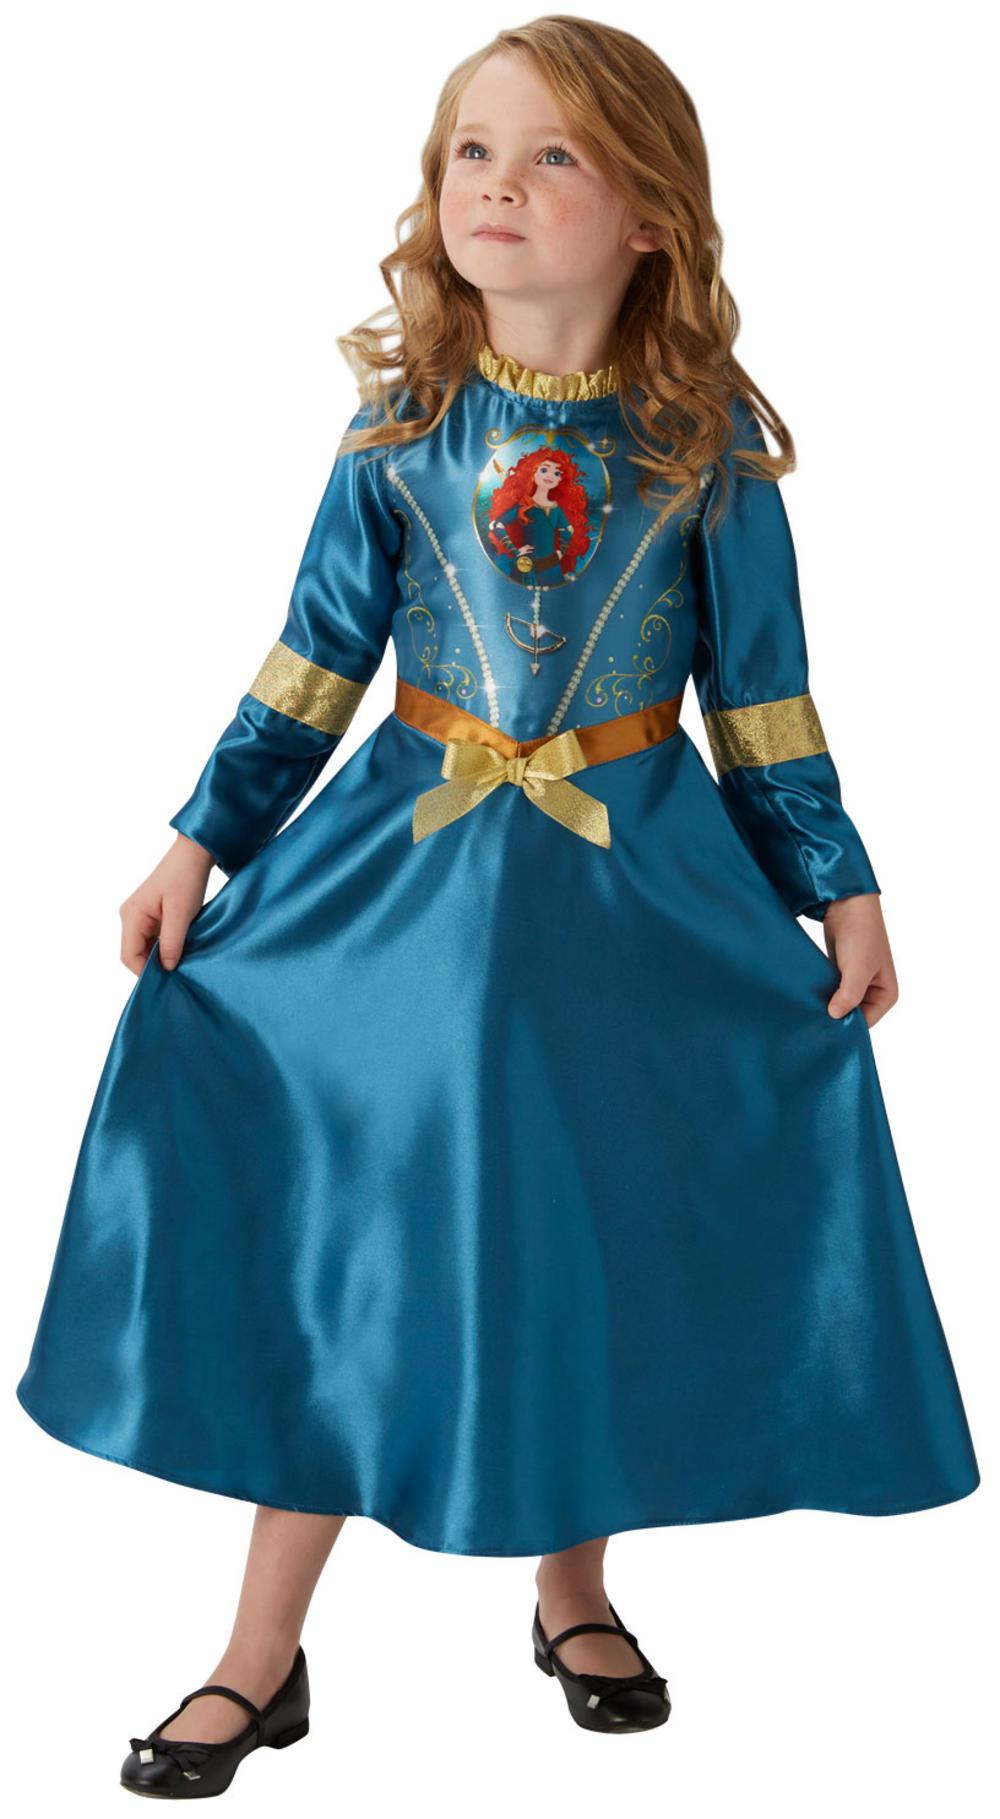 Merida Girls Fancy Dress Disney Princess Brave Fairytale Book Childrens Costume